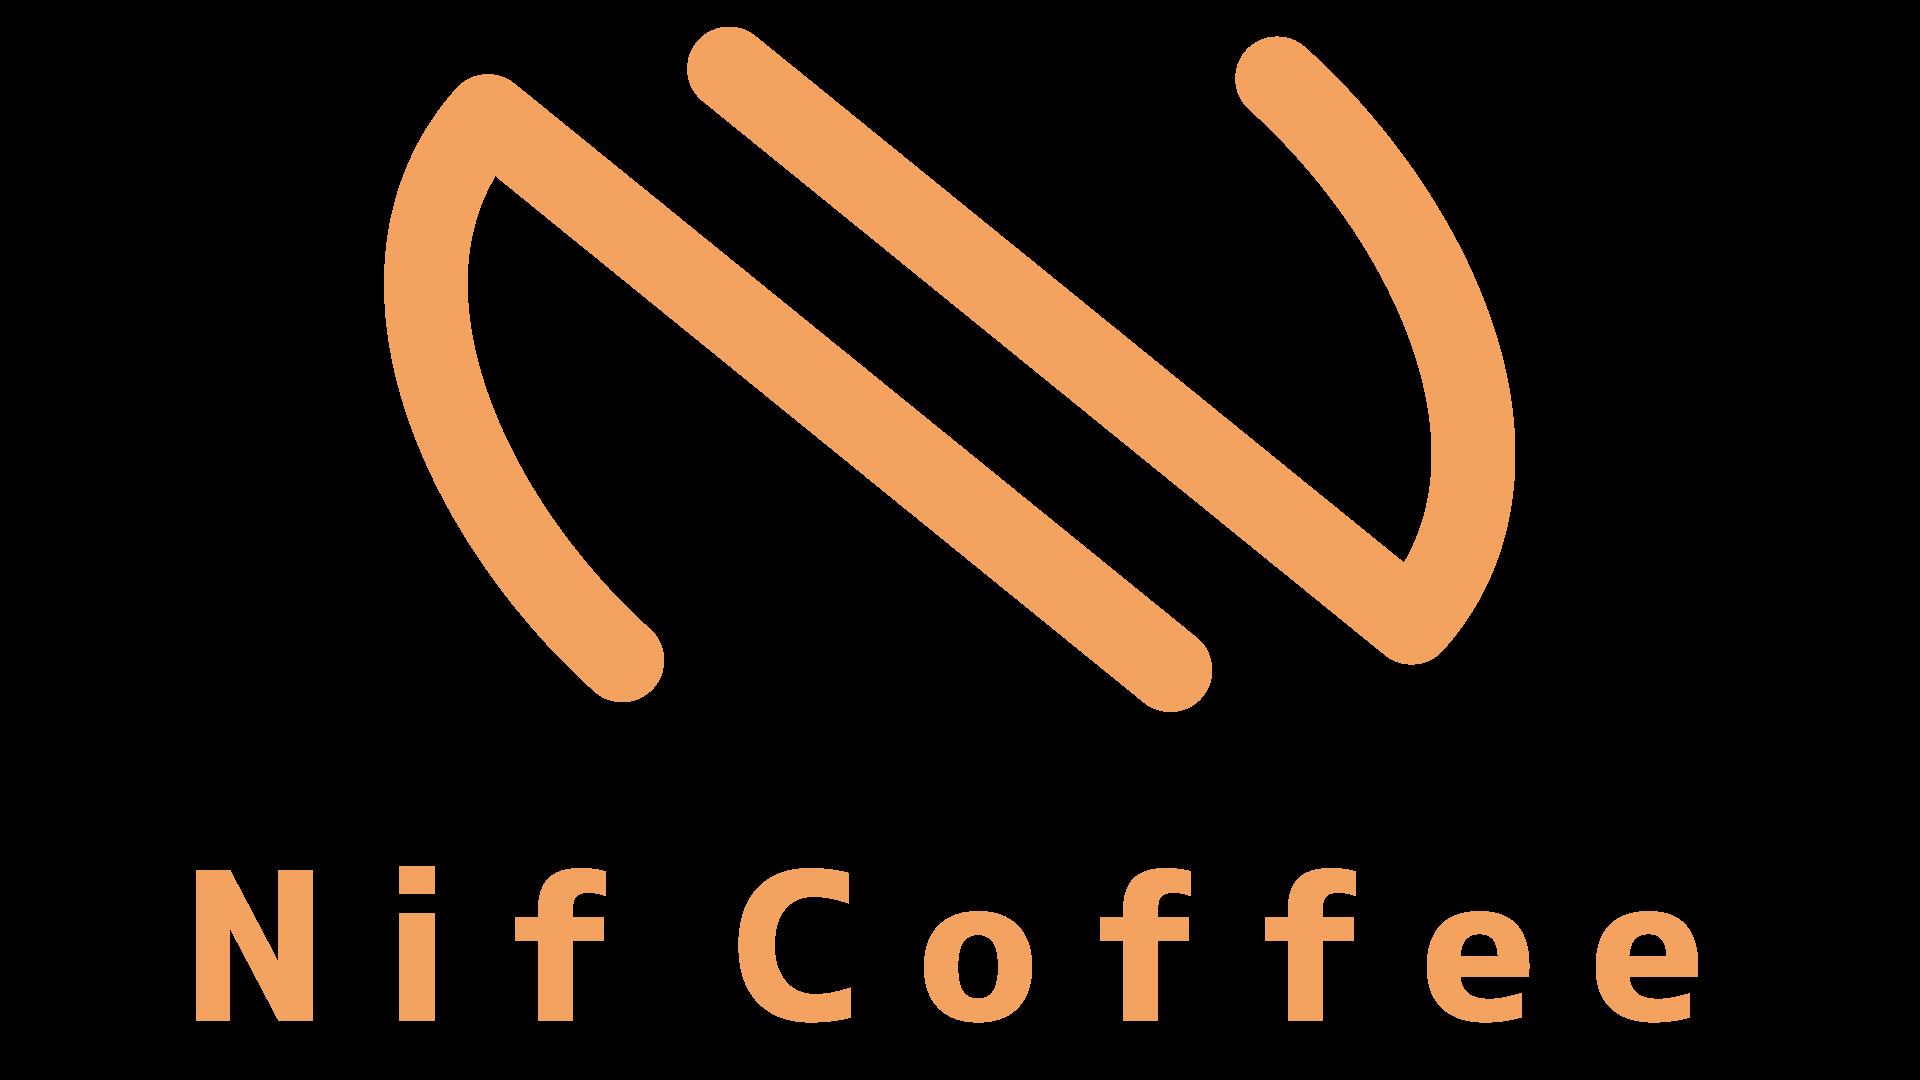 Nif Coffeeネットショップ|ニフコーヒー通販